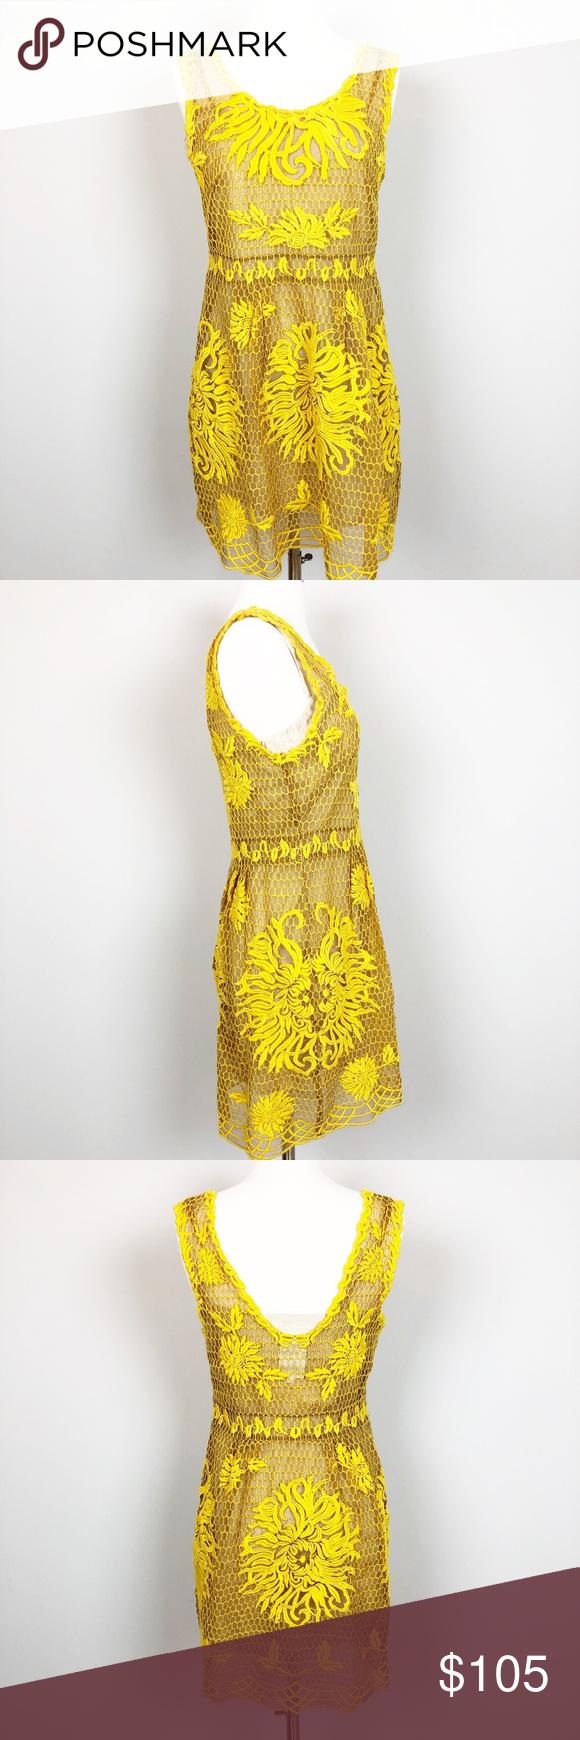 3927487f21a8 Yoana Baraschi Honeycomb Silk Midi Shealth Dress This is a gorgeous mustard yellow  Anthropologie midi lace sheath dress, Yoana Baraschi Honeycomb Yellow ...